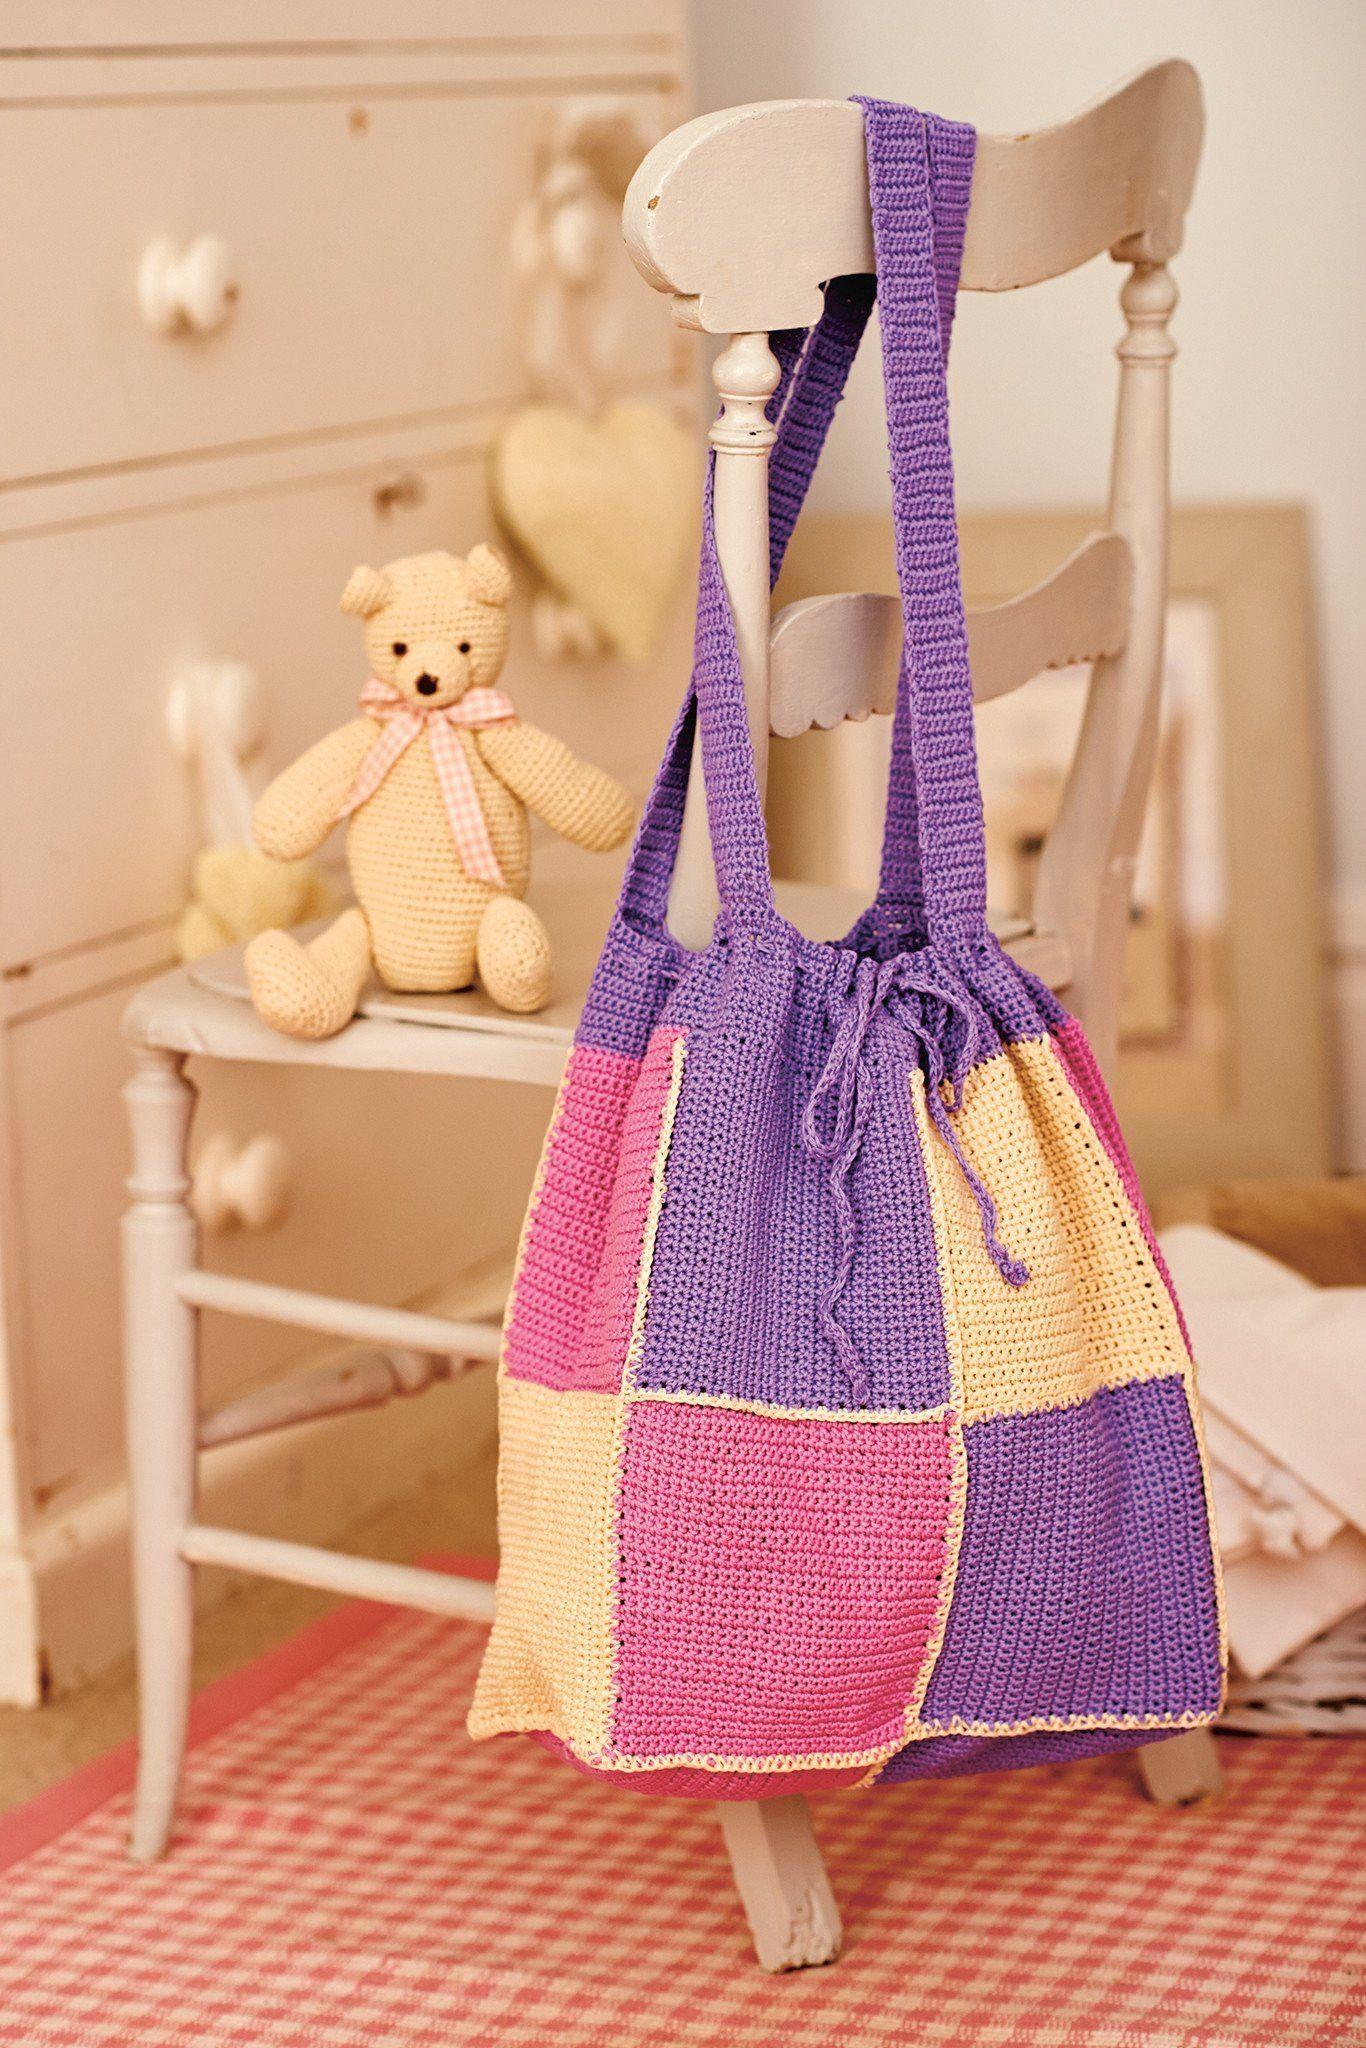 Free Crochet Teddy Bear and Baby Blanket Pattern | 2048x1366